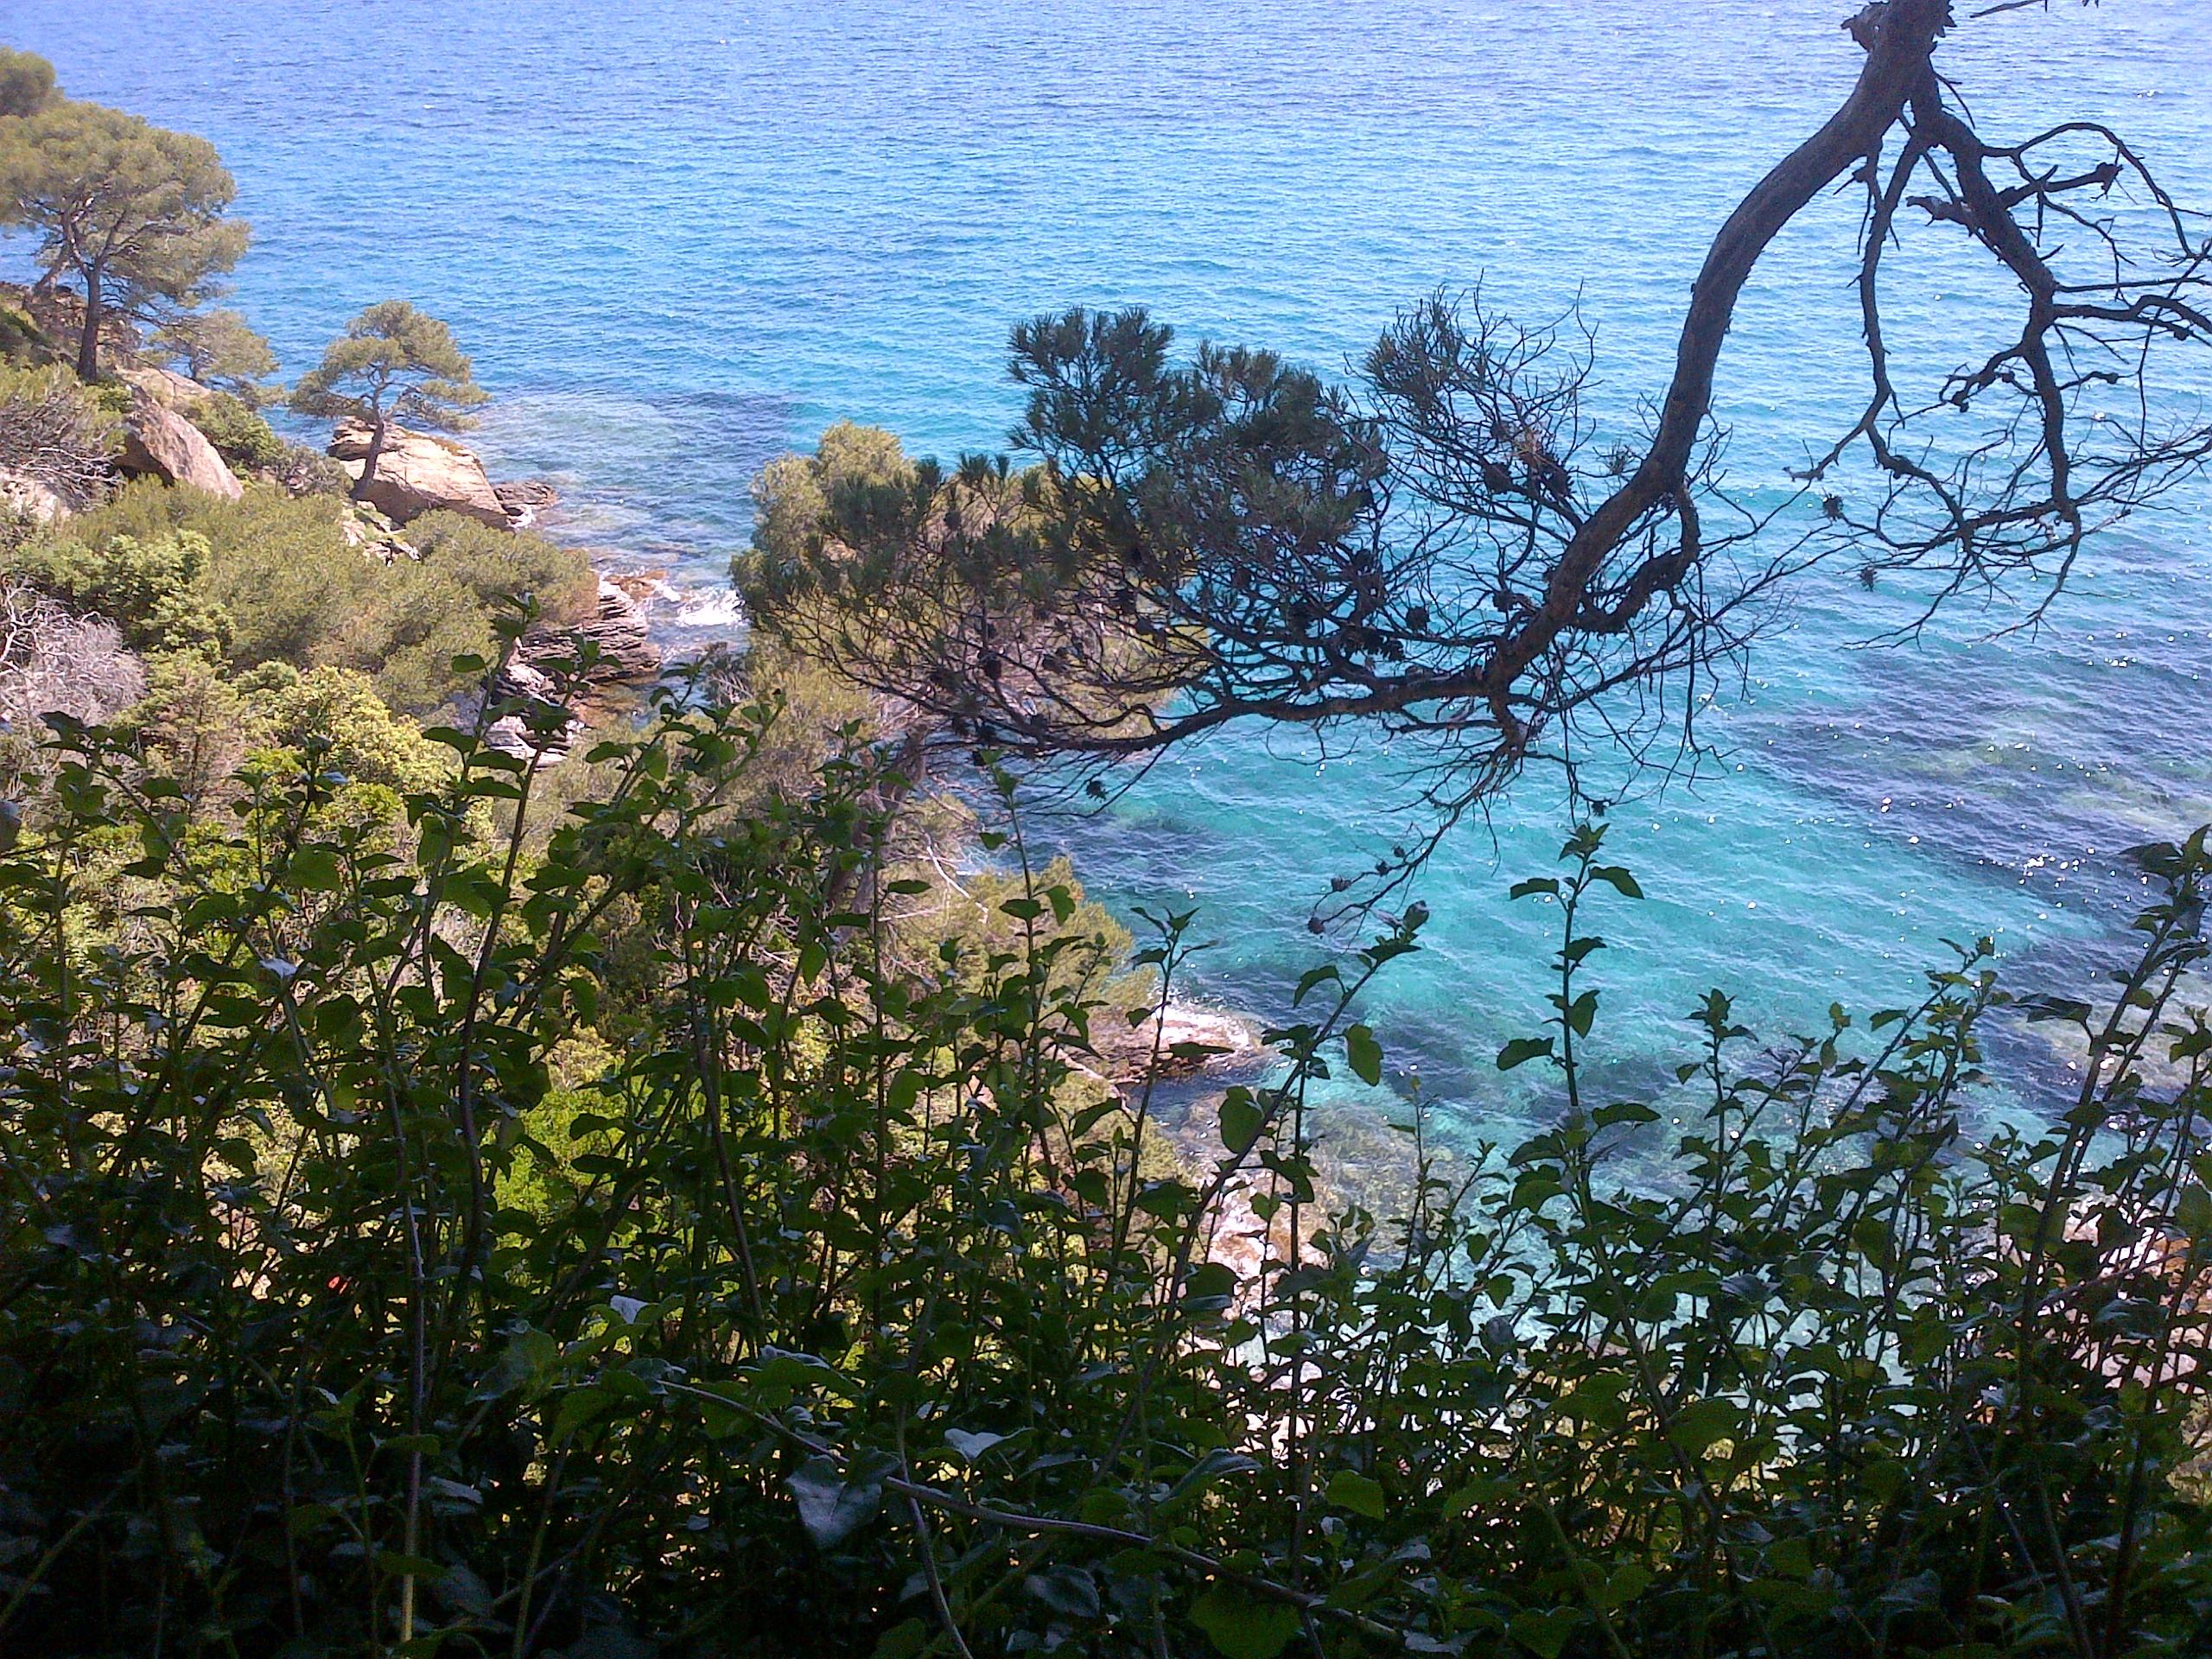 Rayol-Canadel-sur-Mer-20130607-00127.jpg